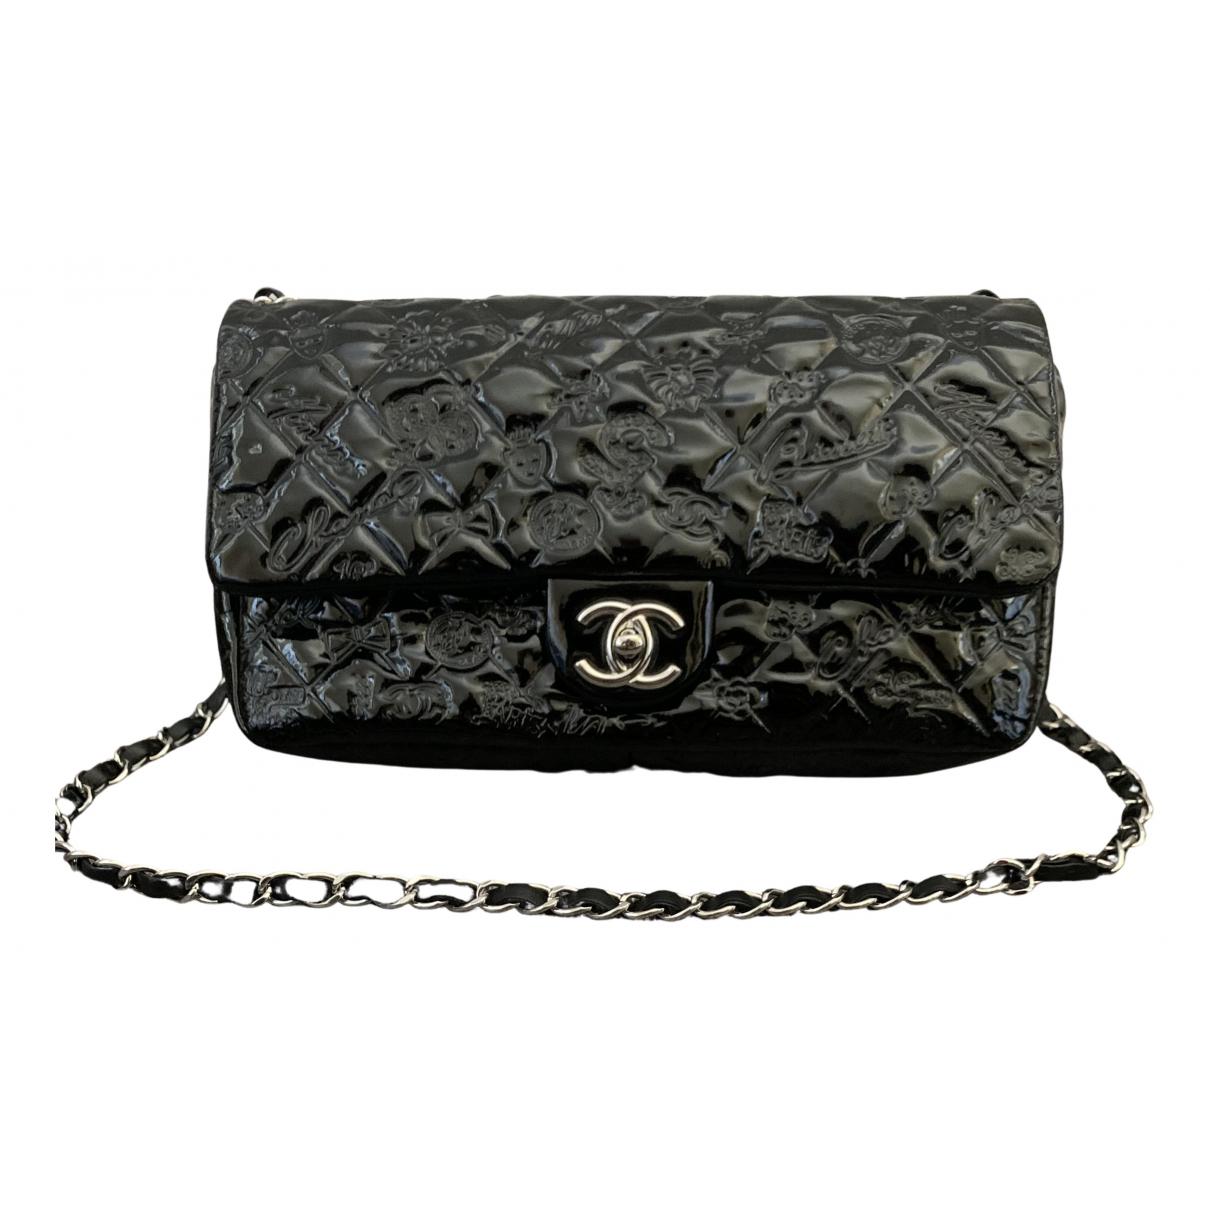 Chanel Timeless/Classique Black Patent leather handbag for Women N